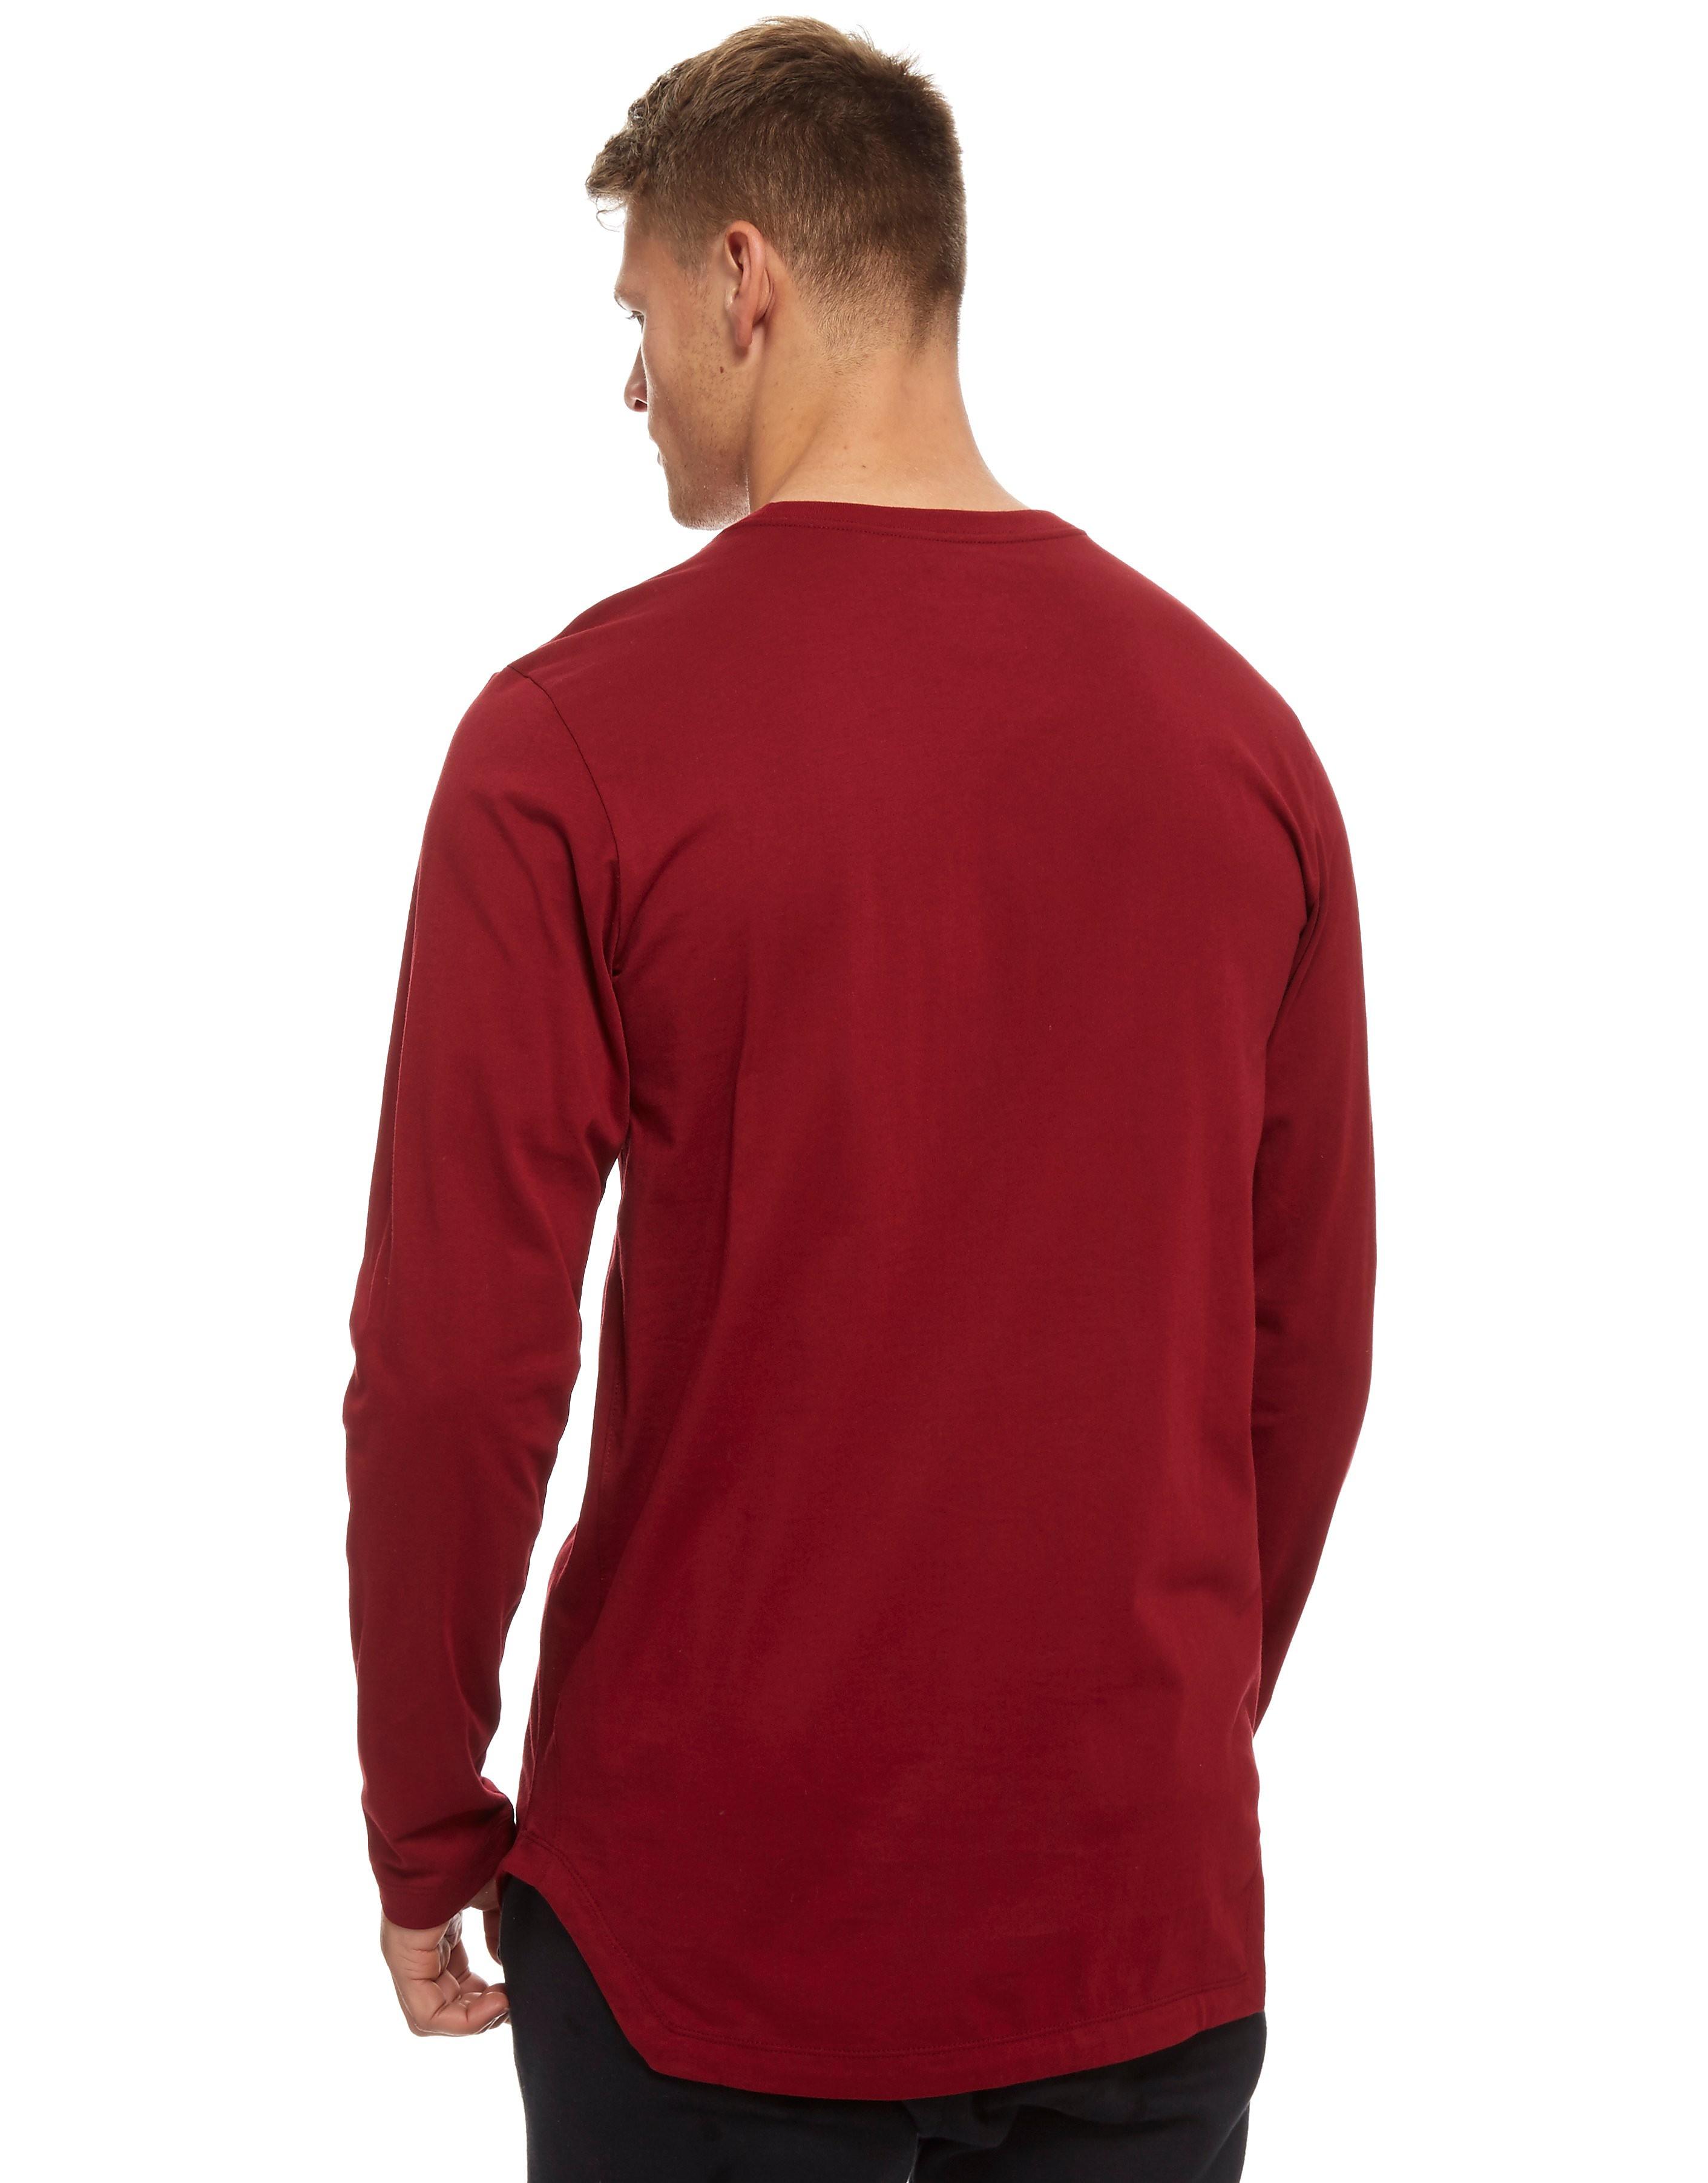 Nike Modern Long Sleeve T-Shirt